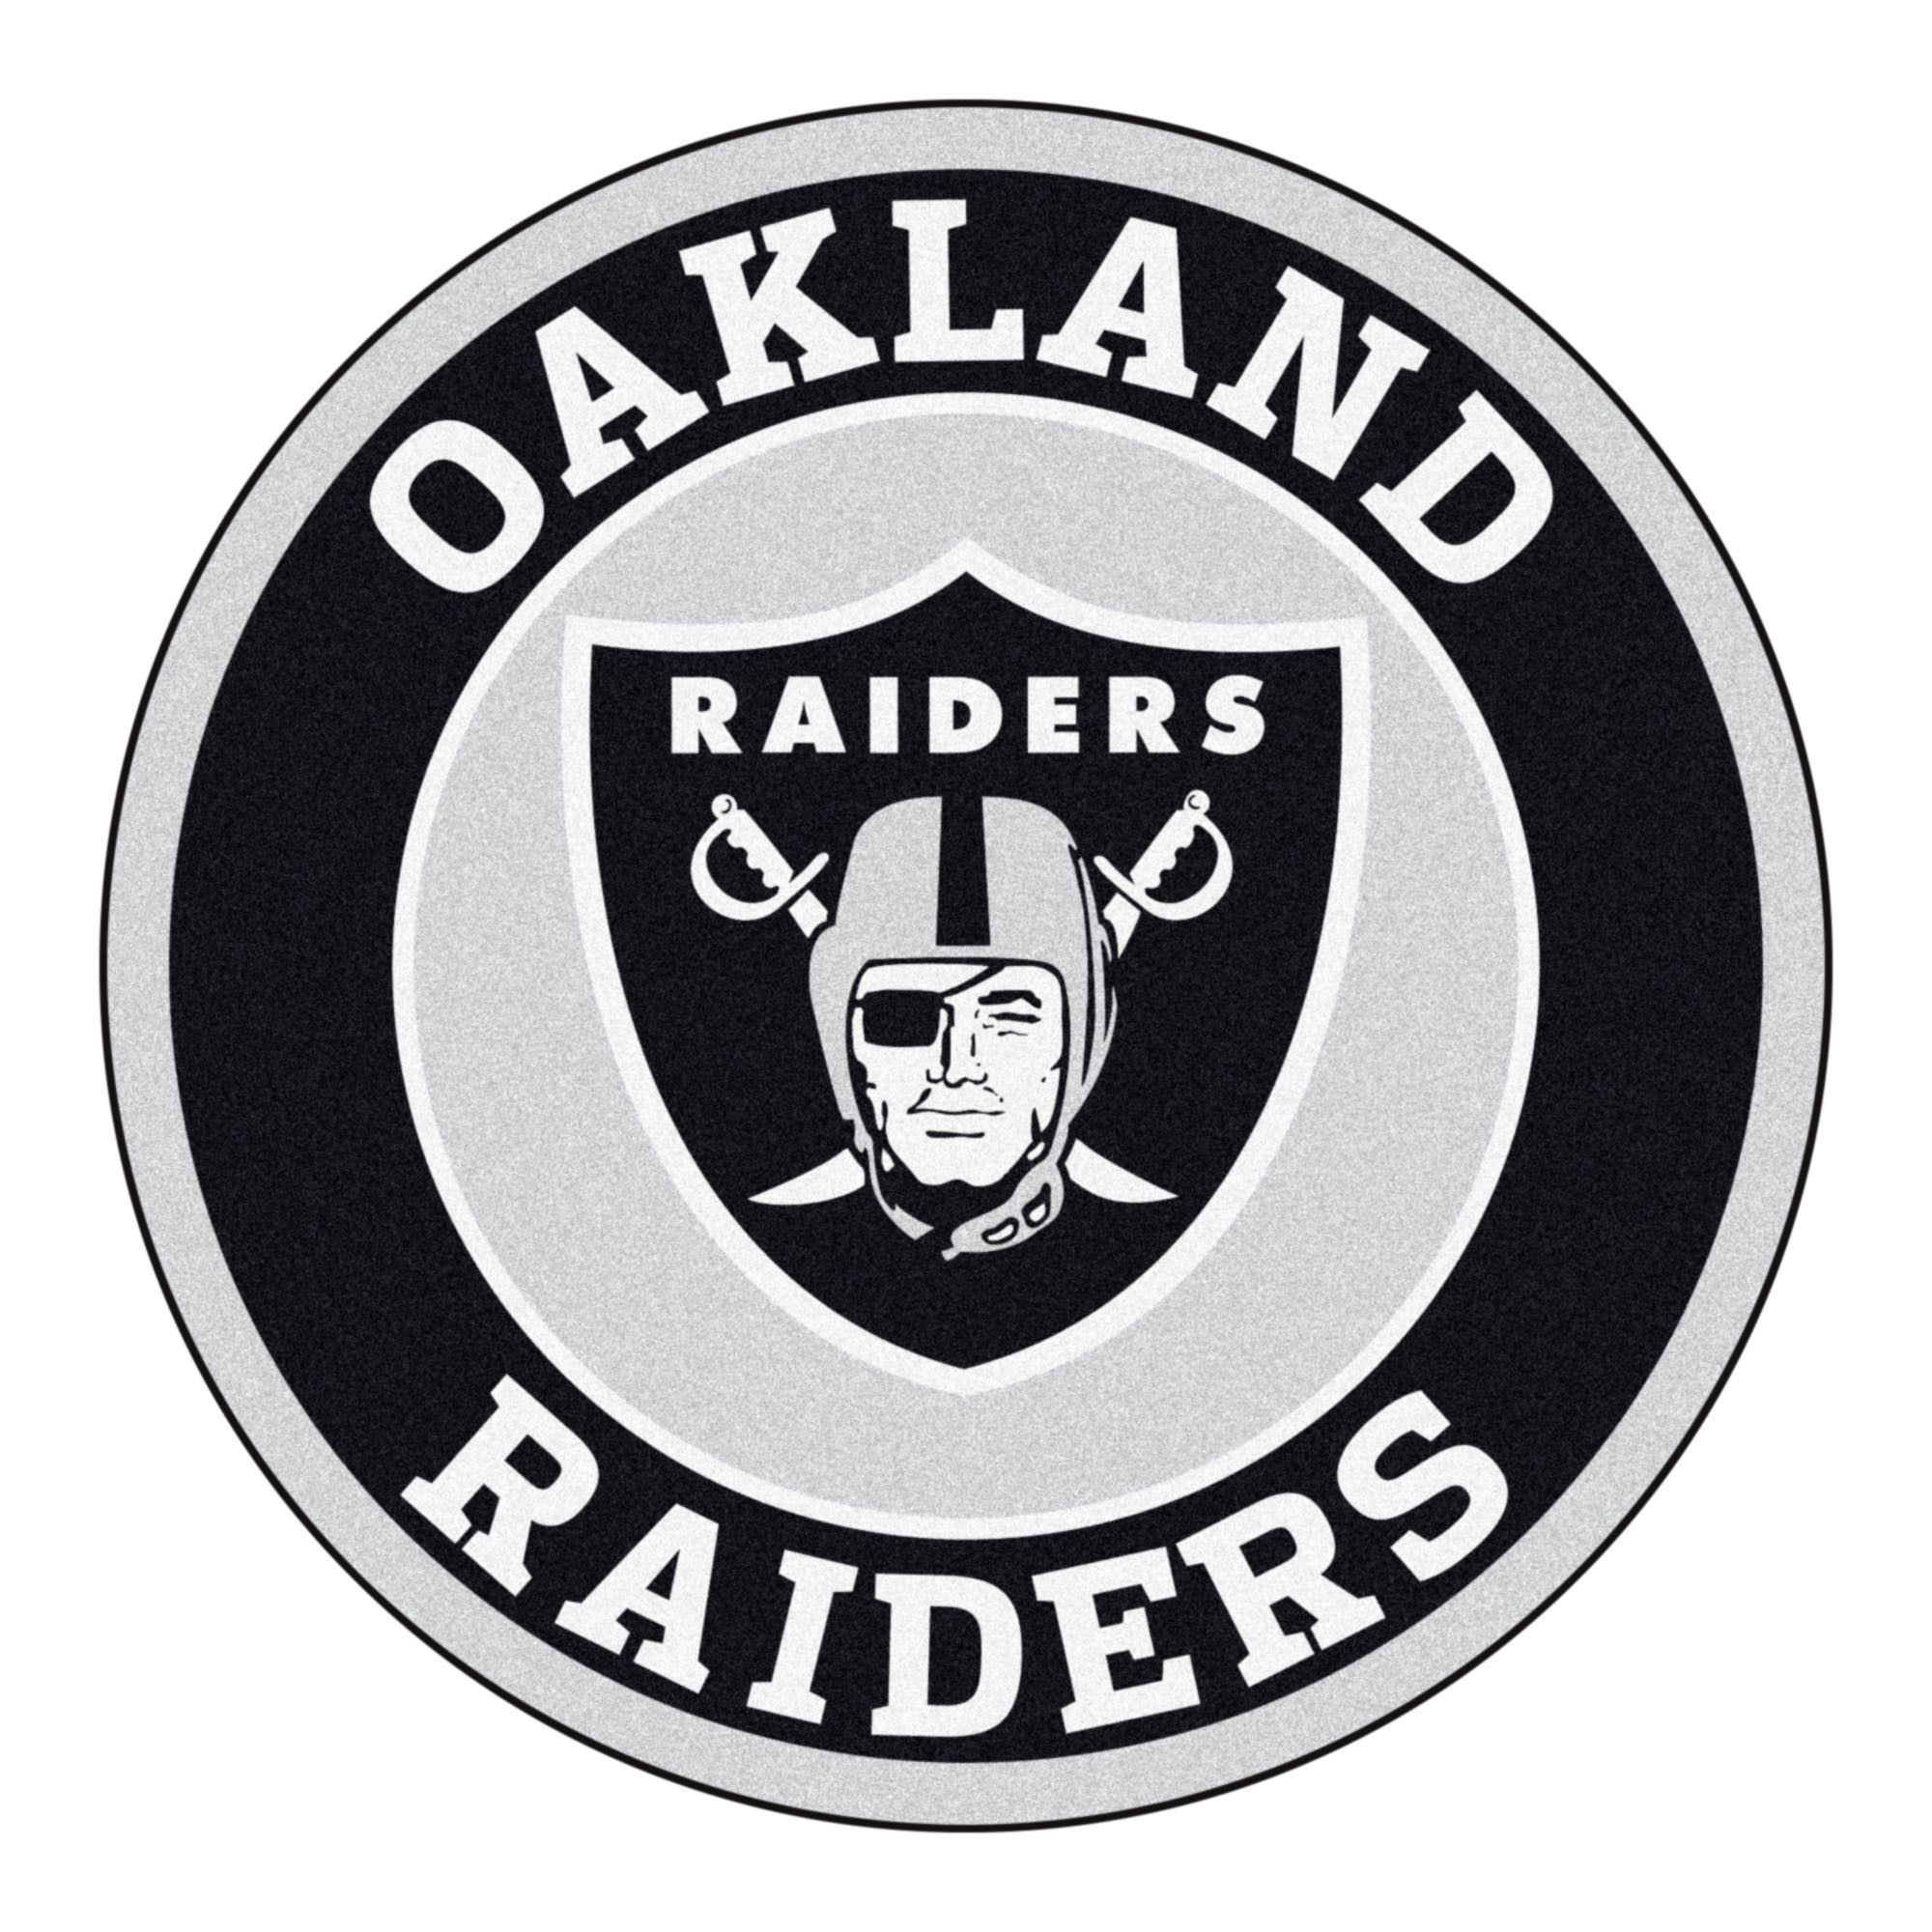 roundel mat - oakland raiders | raiders, raider nation and okland